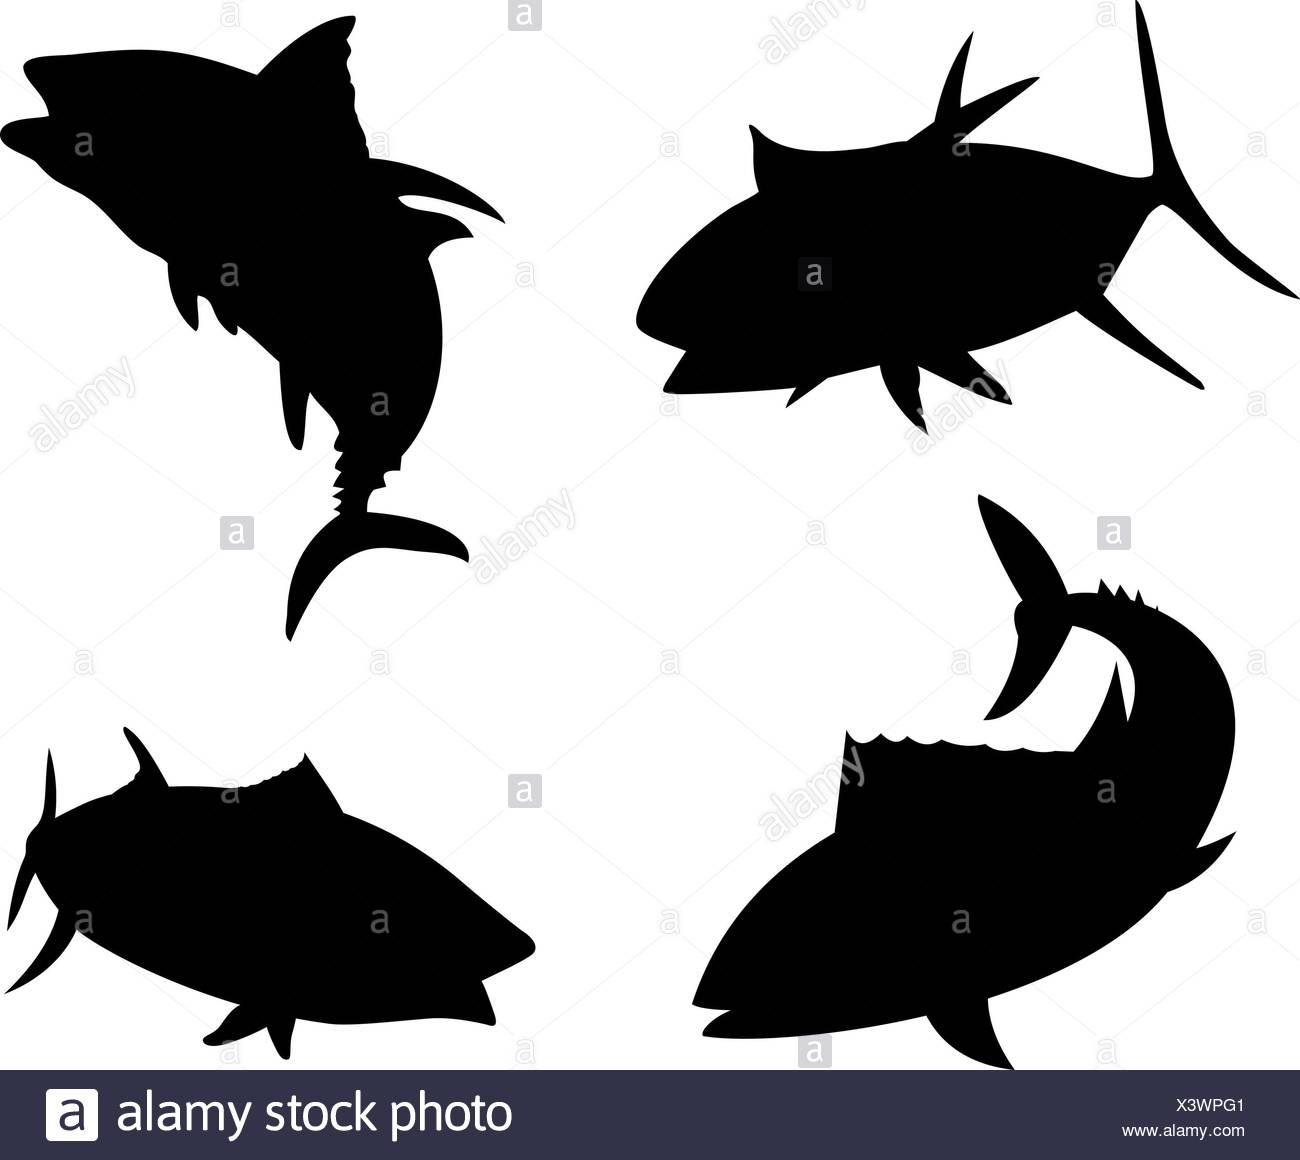 Yellow Fin Tuna Fish Silhouette Stock Photo: 277776353 - Alamy